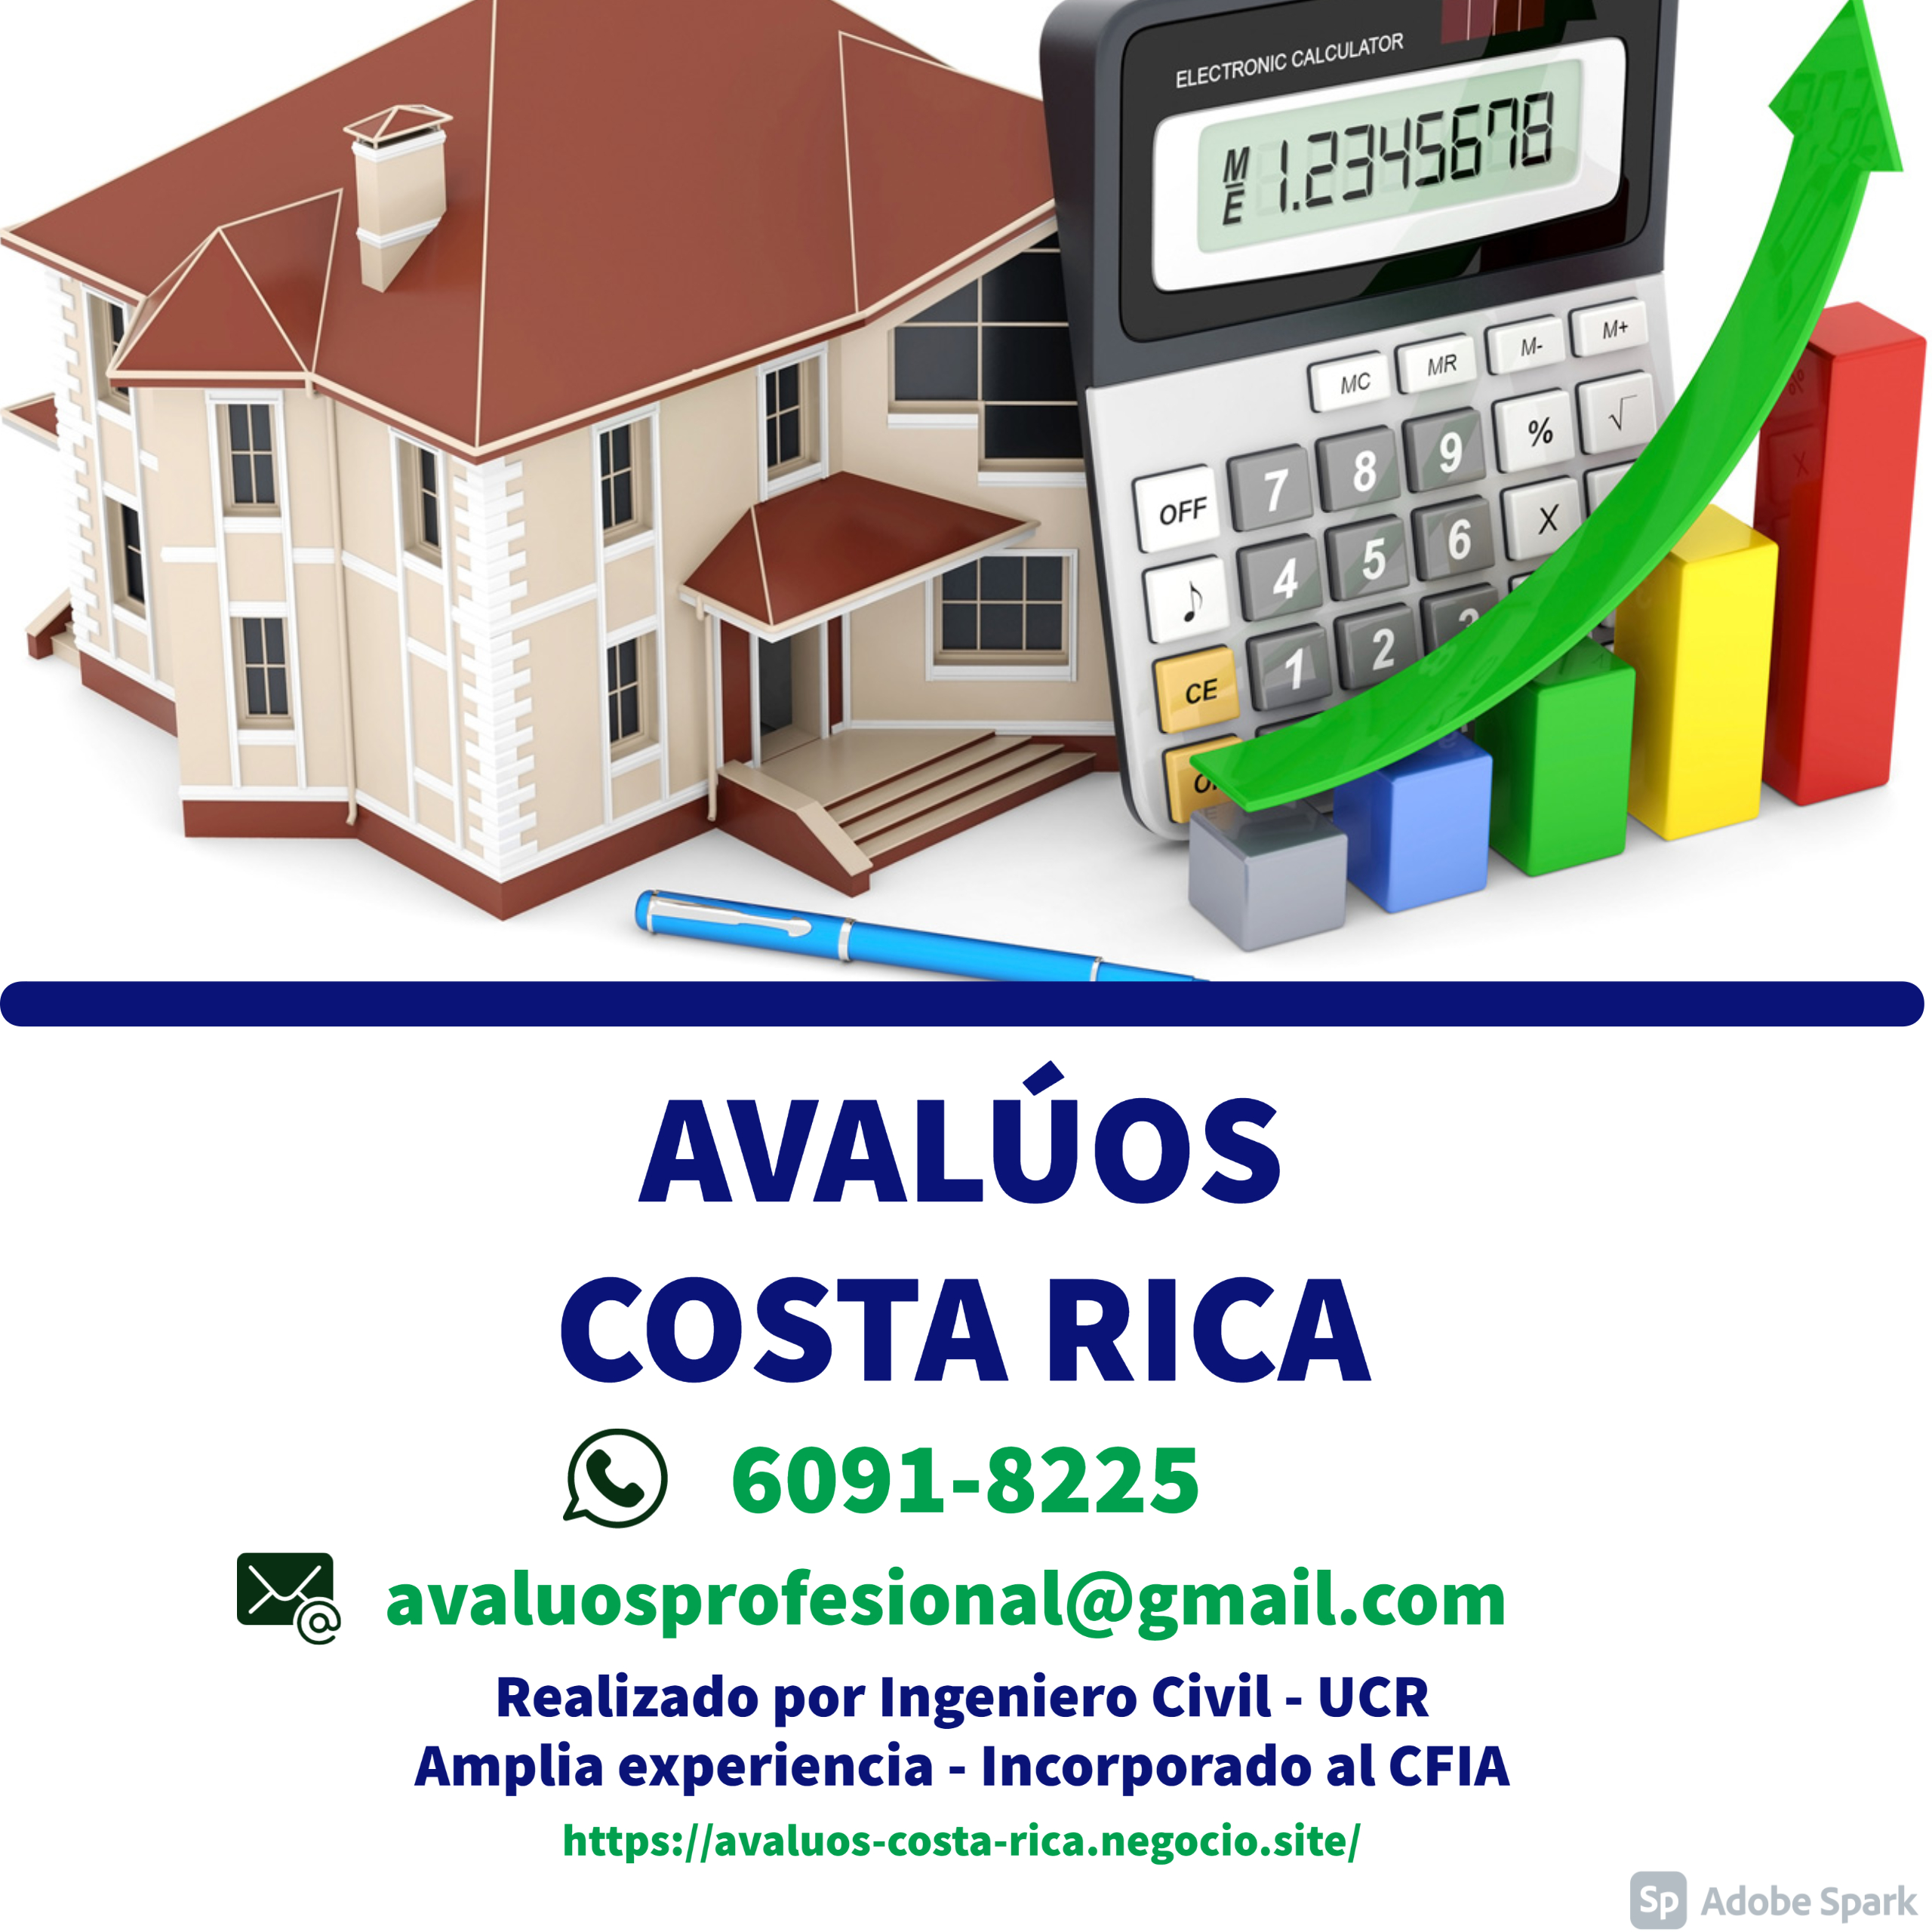 Avalúos Costa Rica ASA